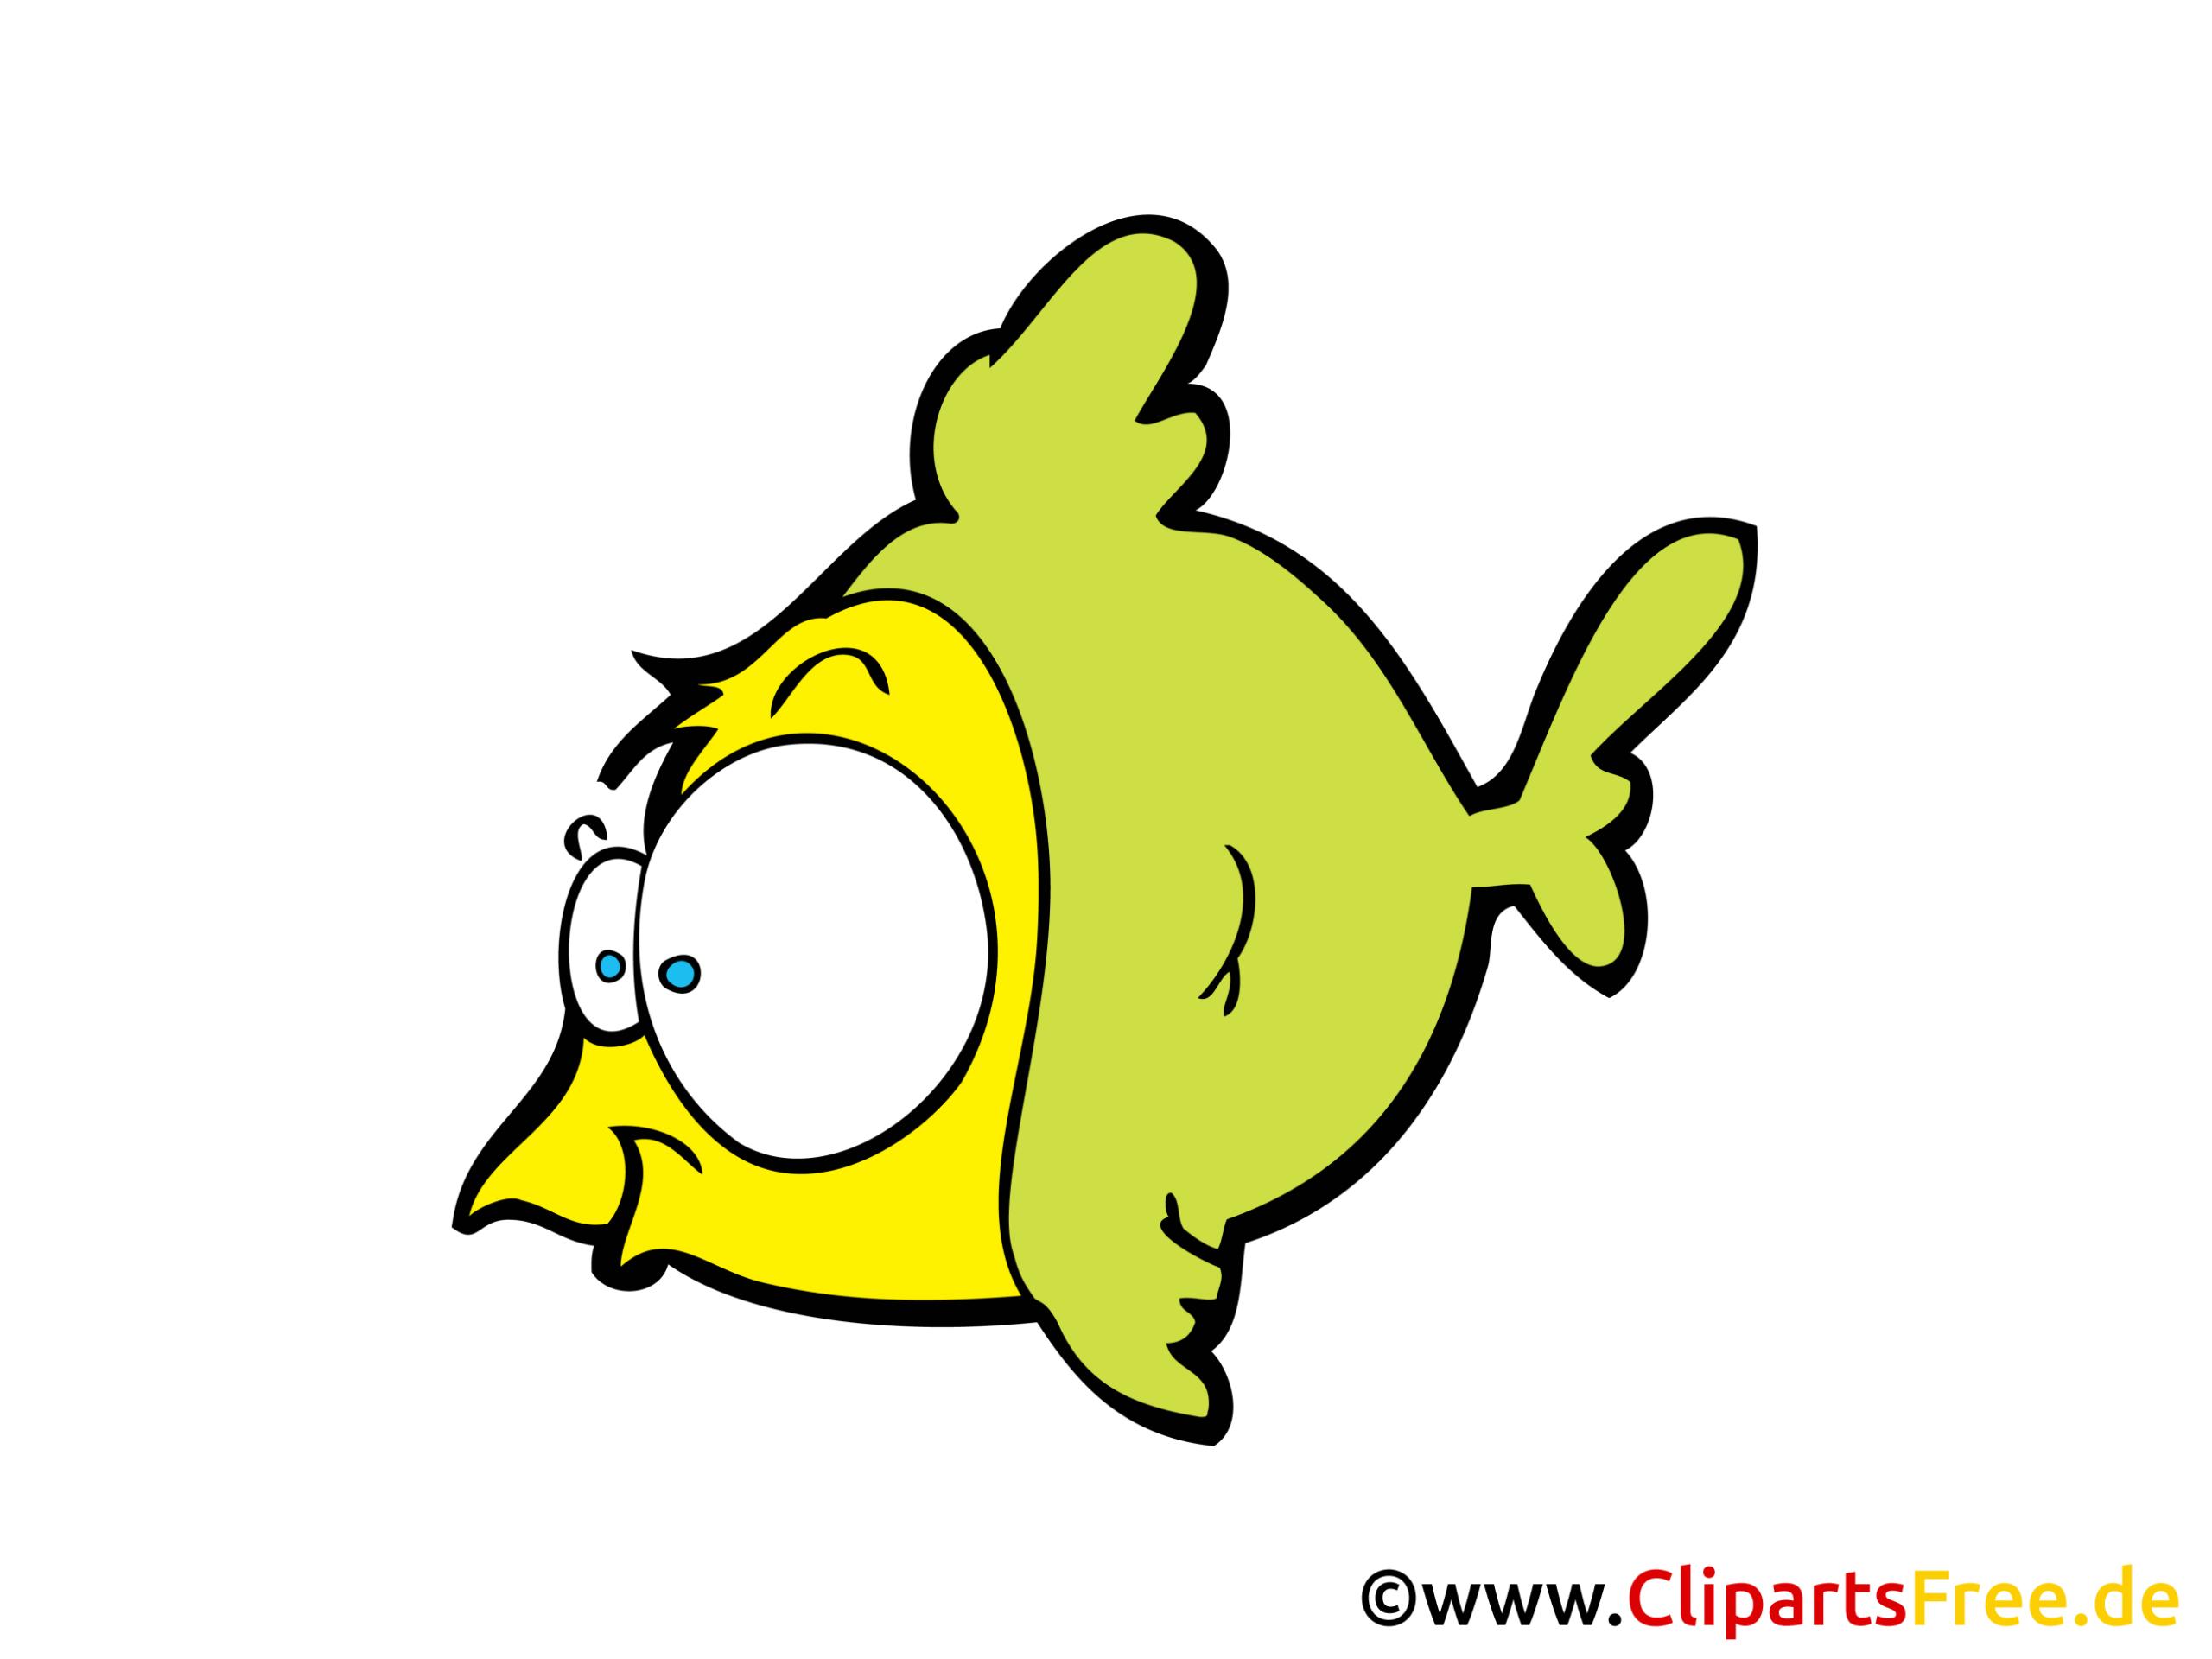 Comic Fisch Clipart, Cartoon, Bild Gratis bei Fische Comic